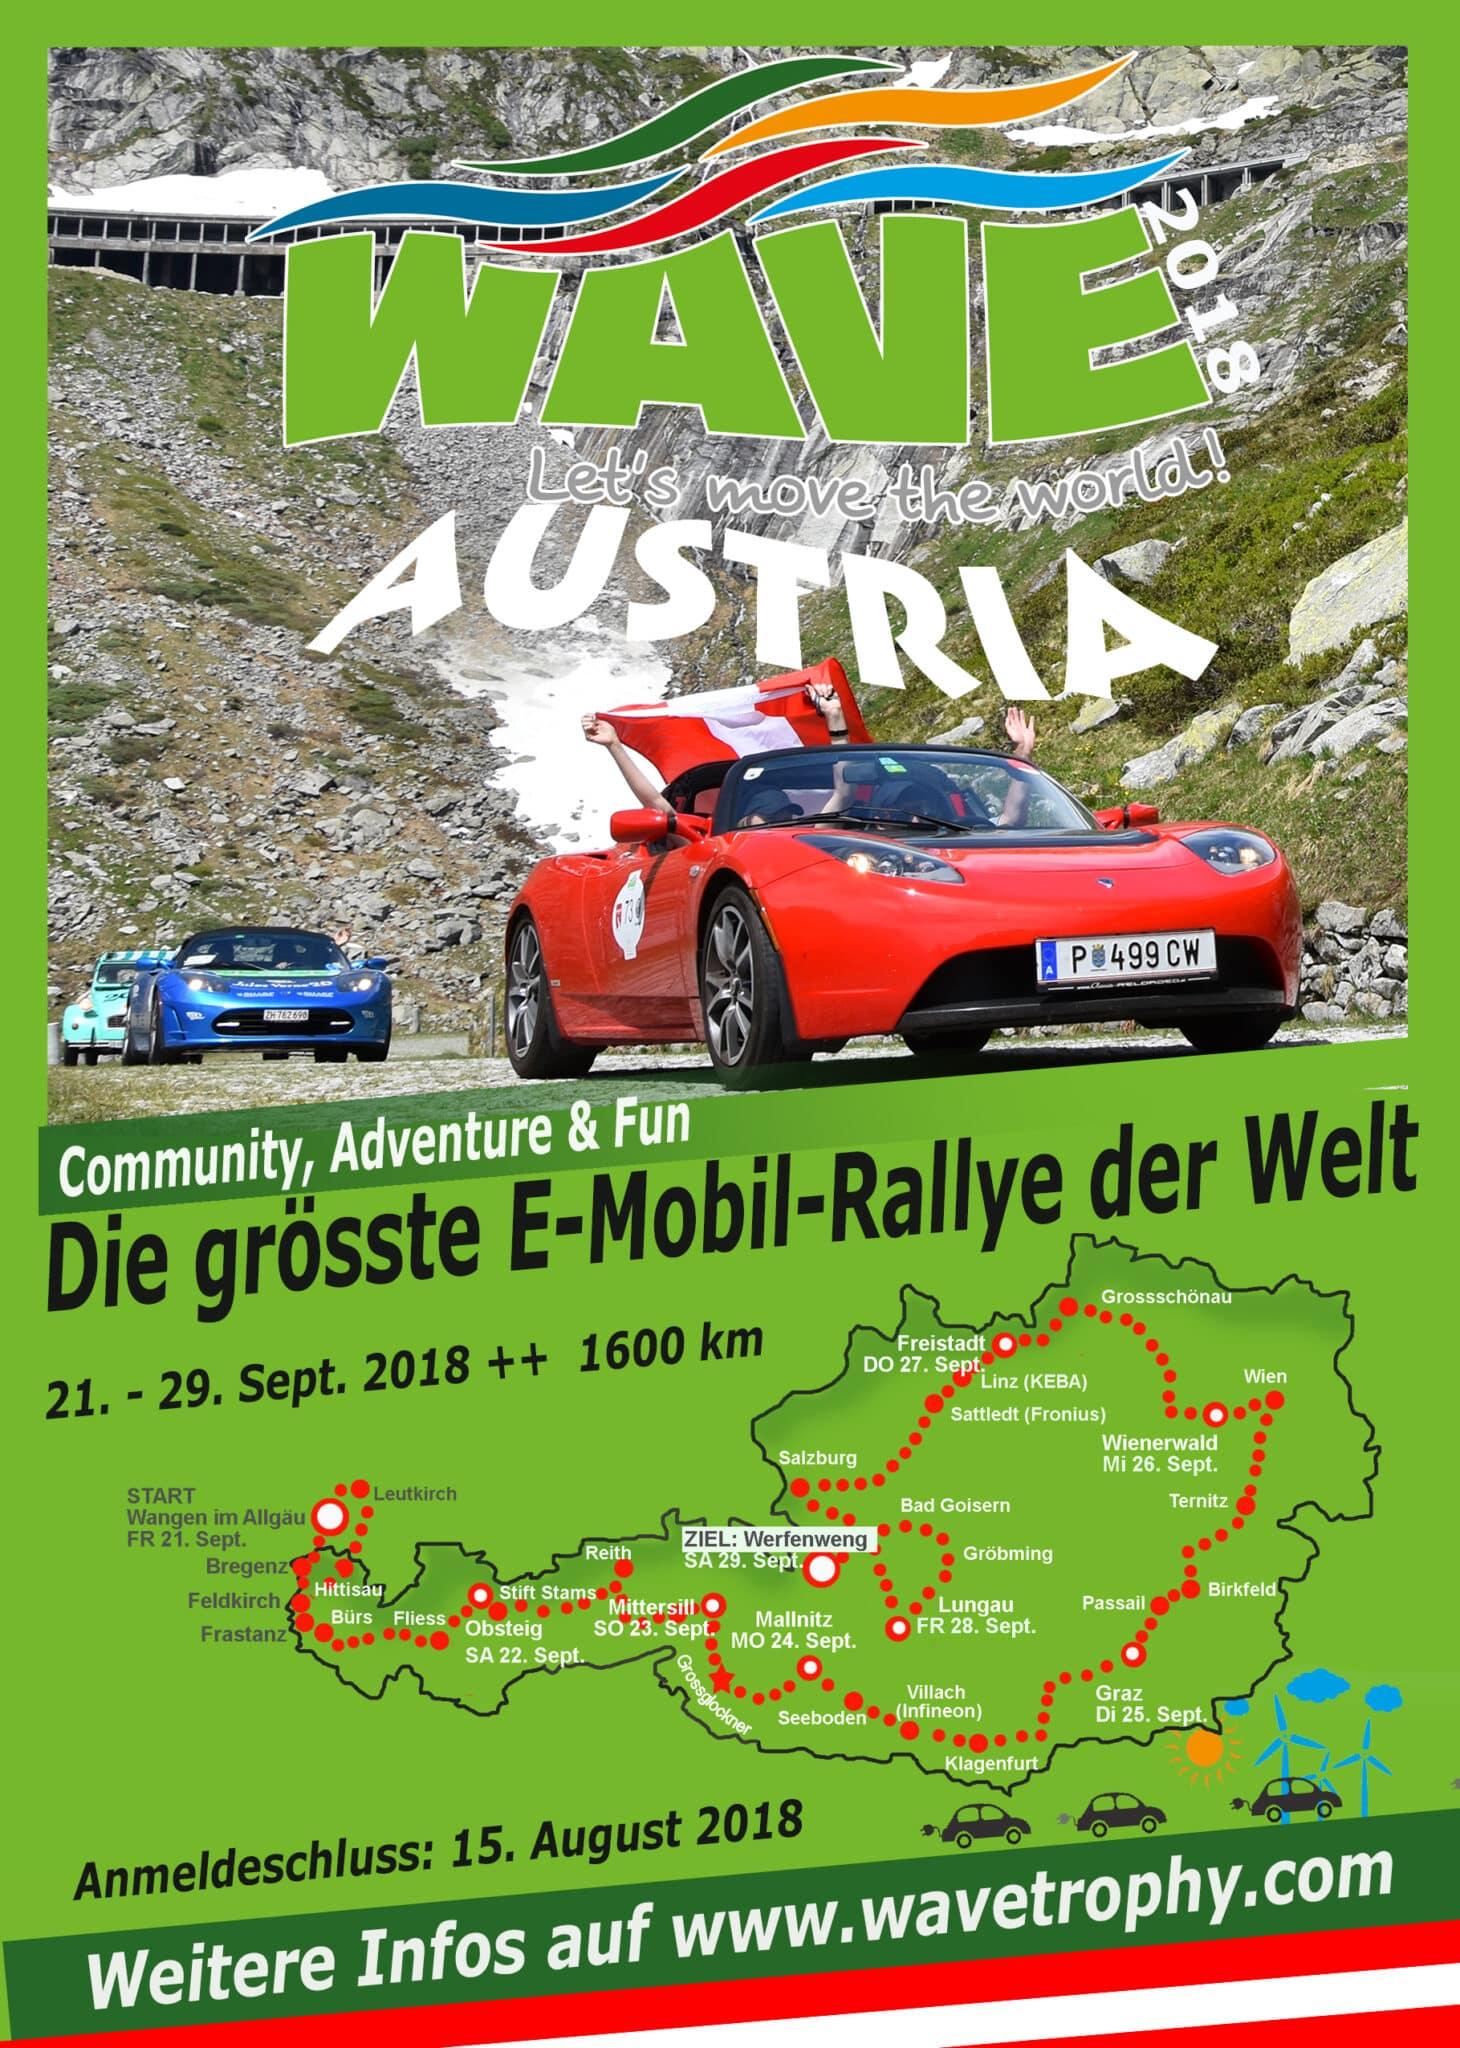 WAVE Trophy 2018 - Elektromobilitäts-Rallye kommt nach Freistadt » Flyer 2018 Austria